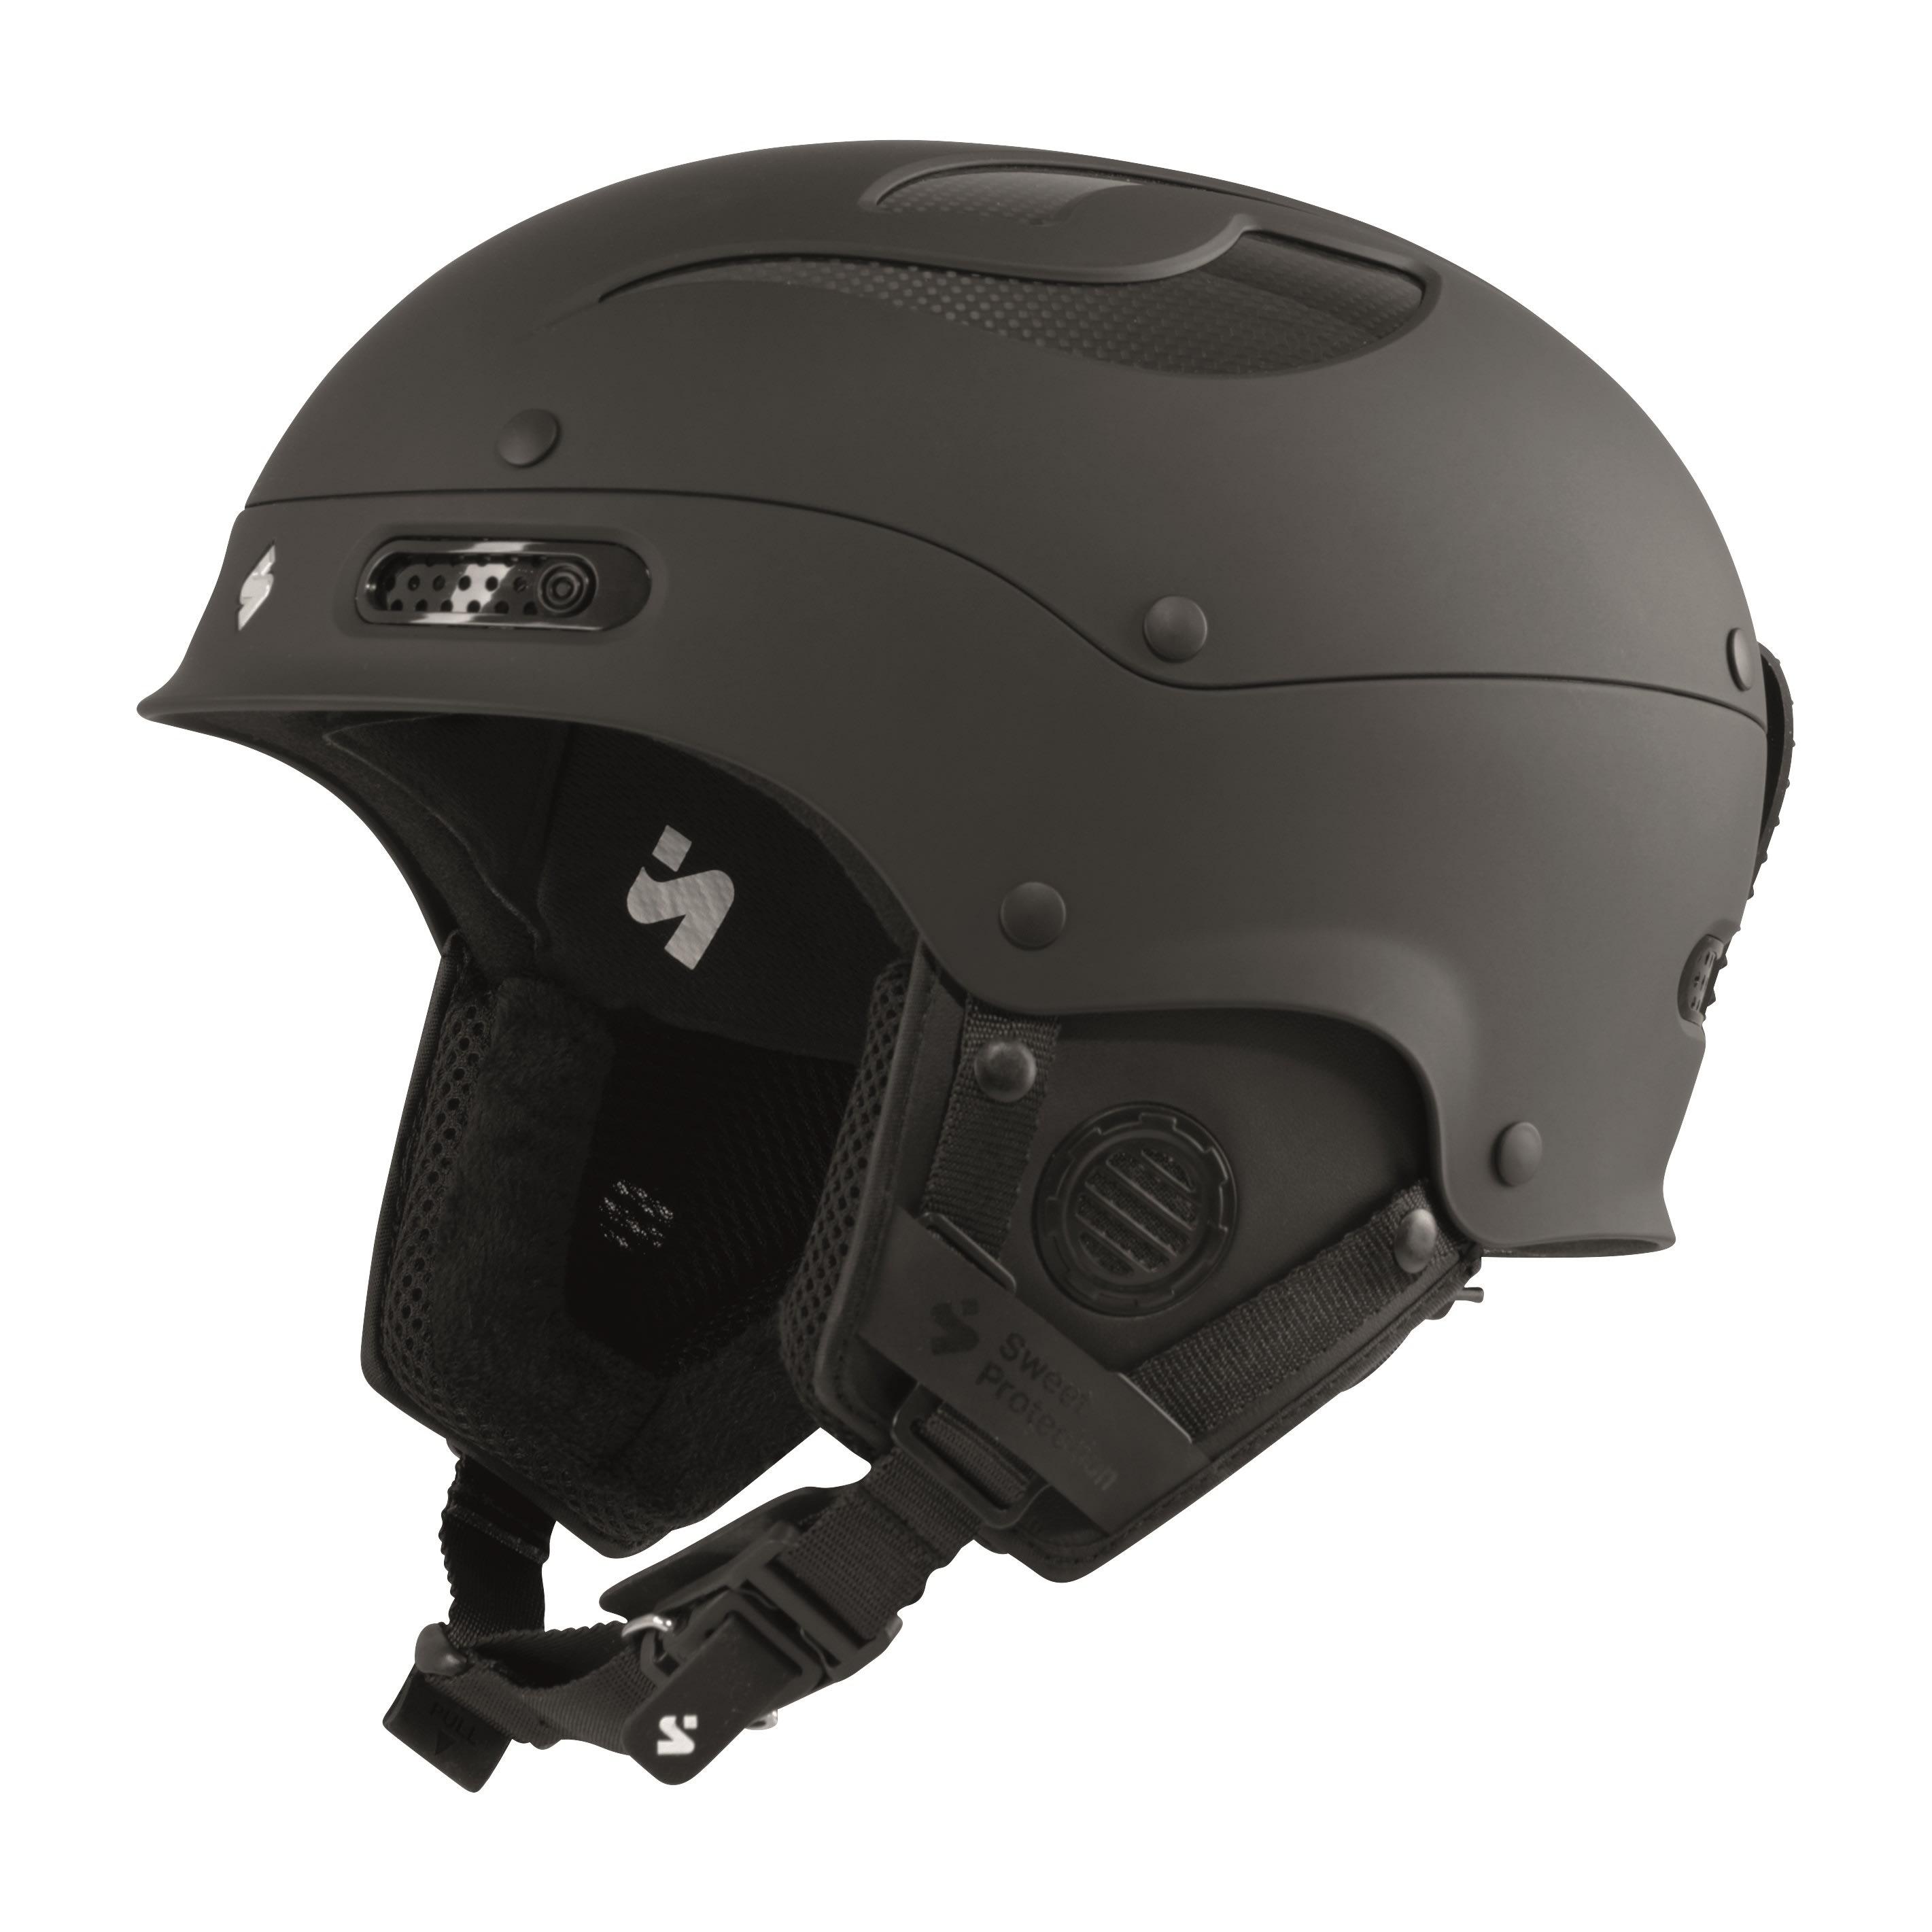 Köp Sweet Protection Trooper II Helmet hos Outnorth d72cb65c61150